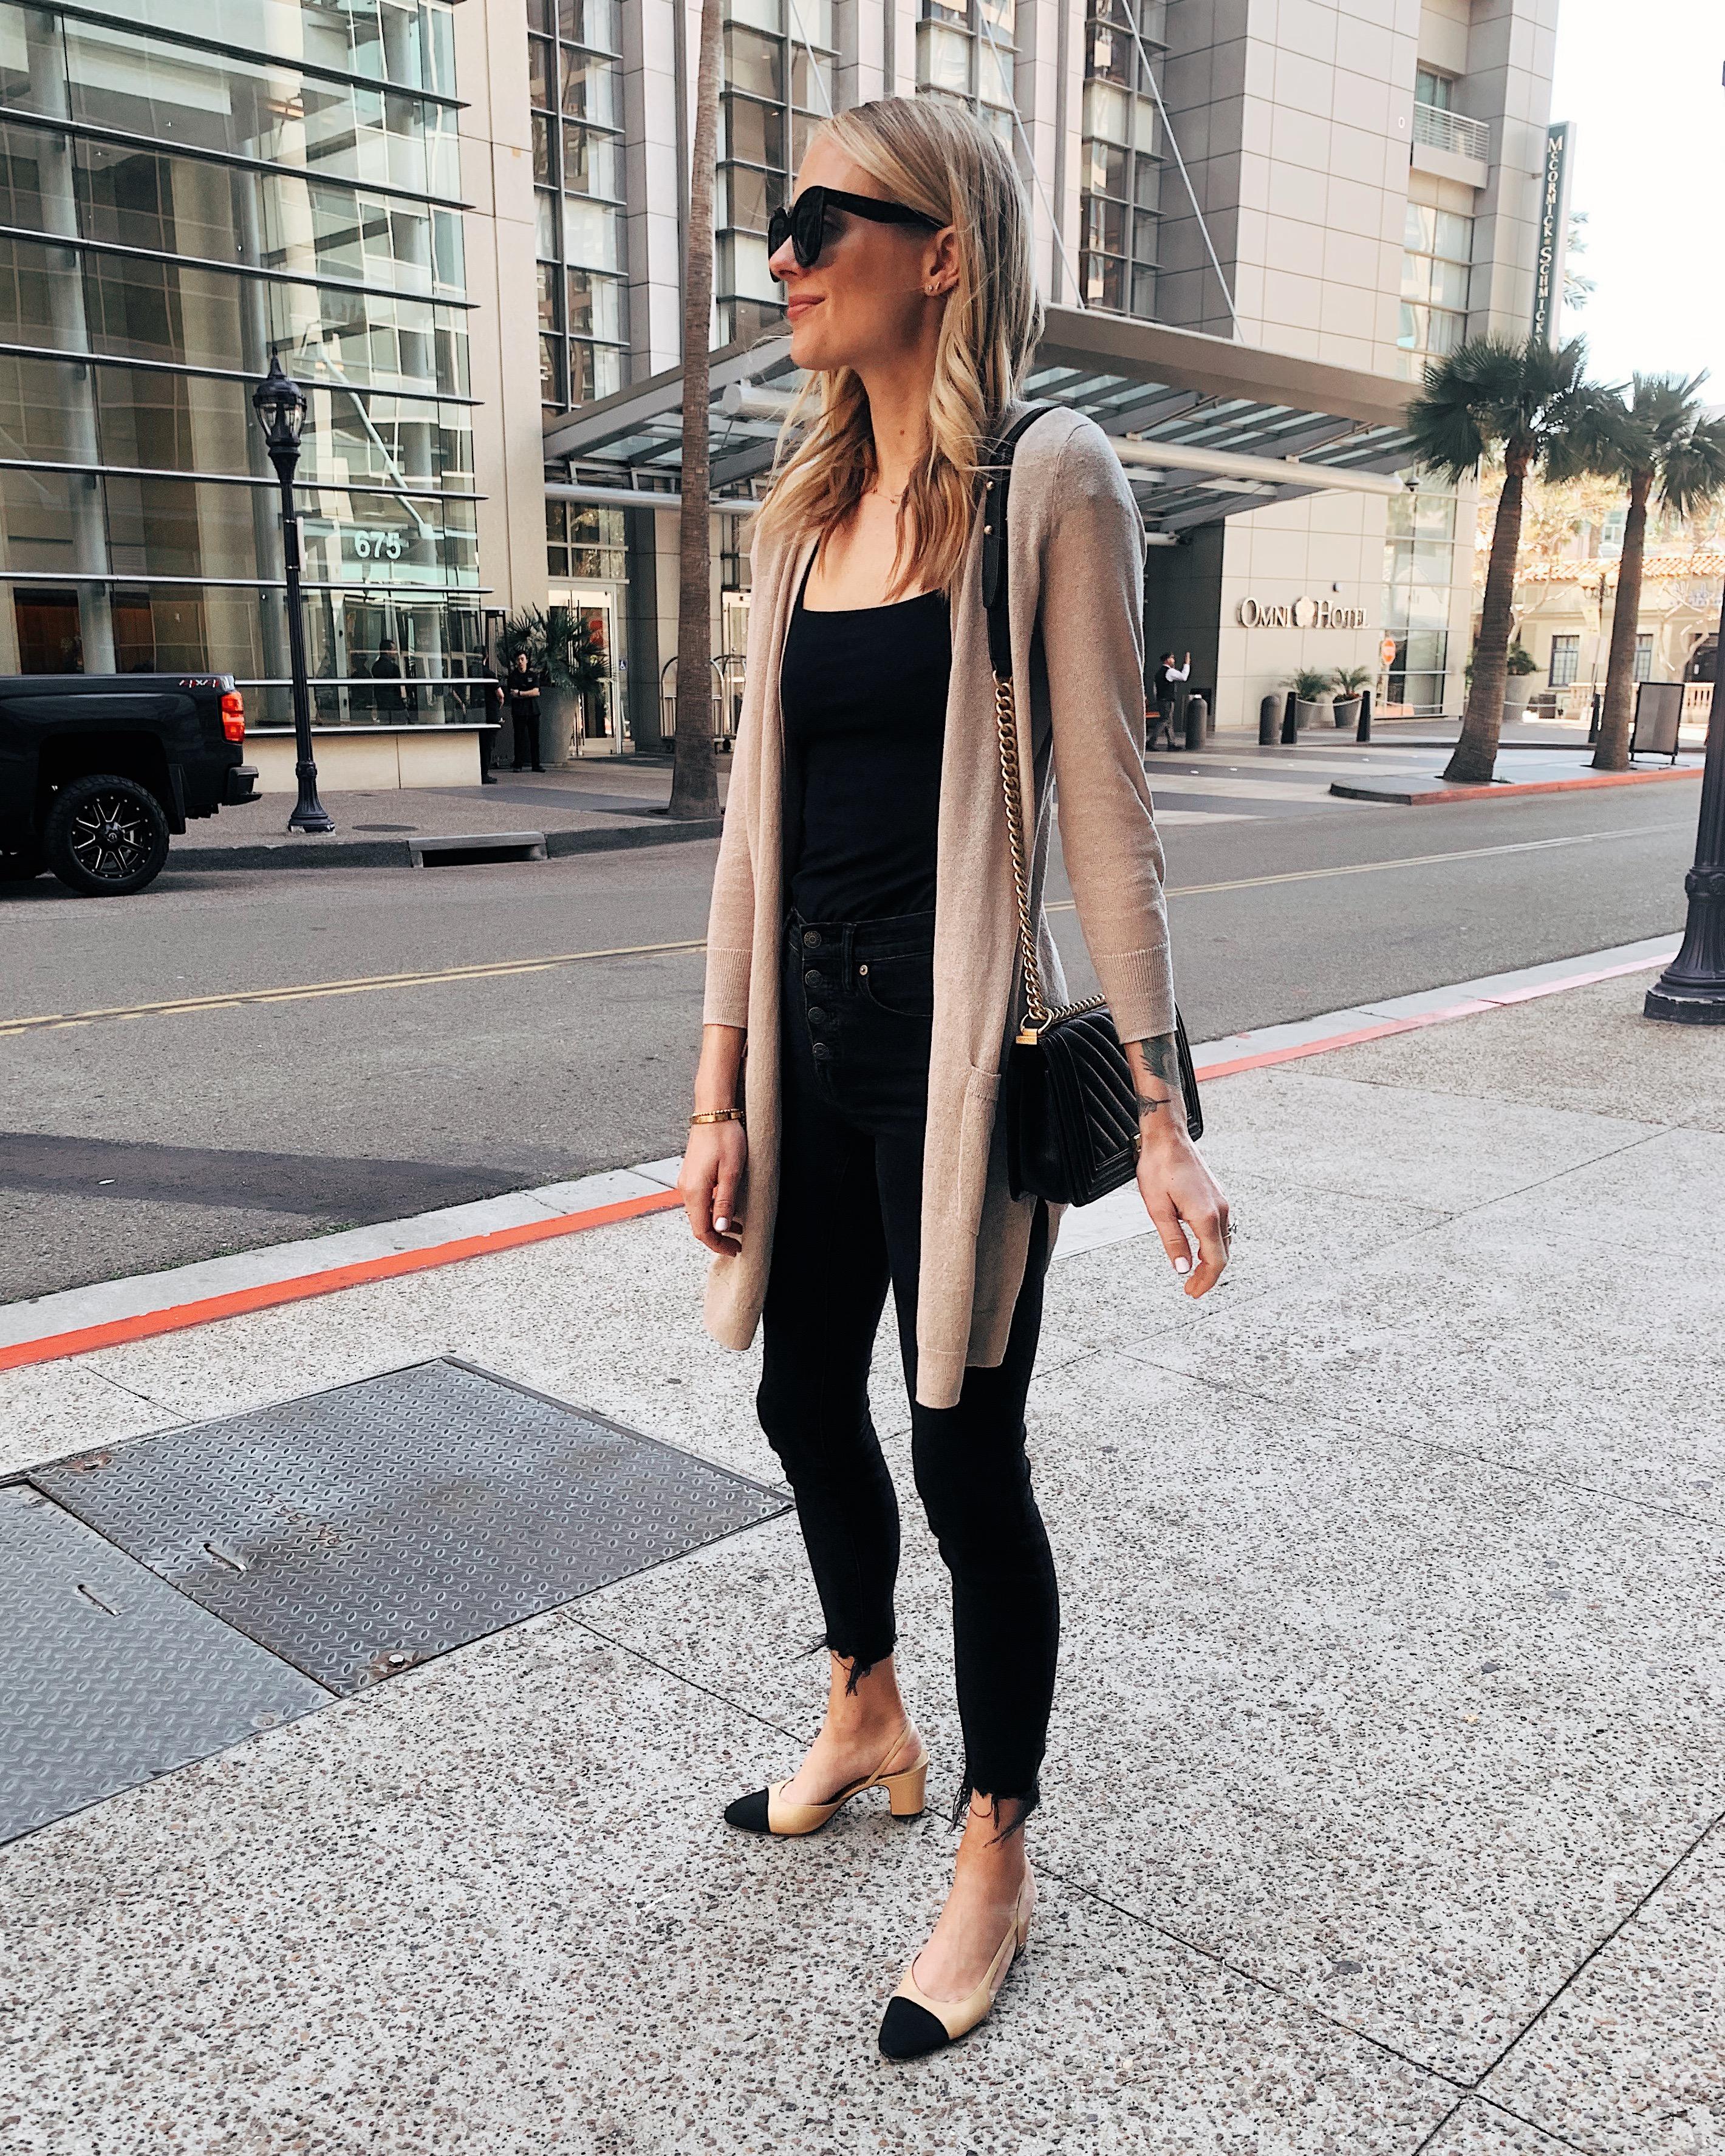 Fashion Jackson Wearing Beige Cardigan Black Top Black Skinny Jeans Chanel Slingbacks